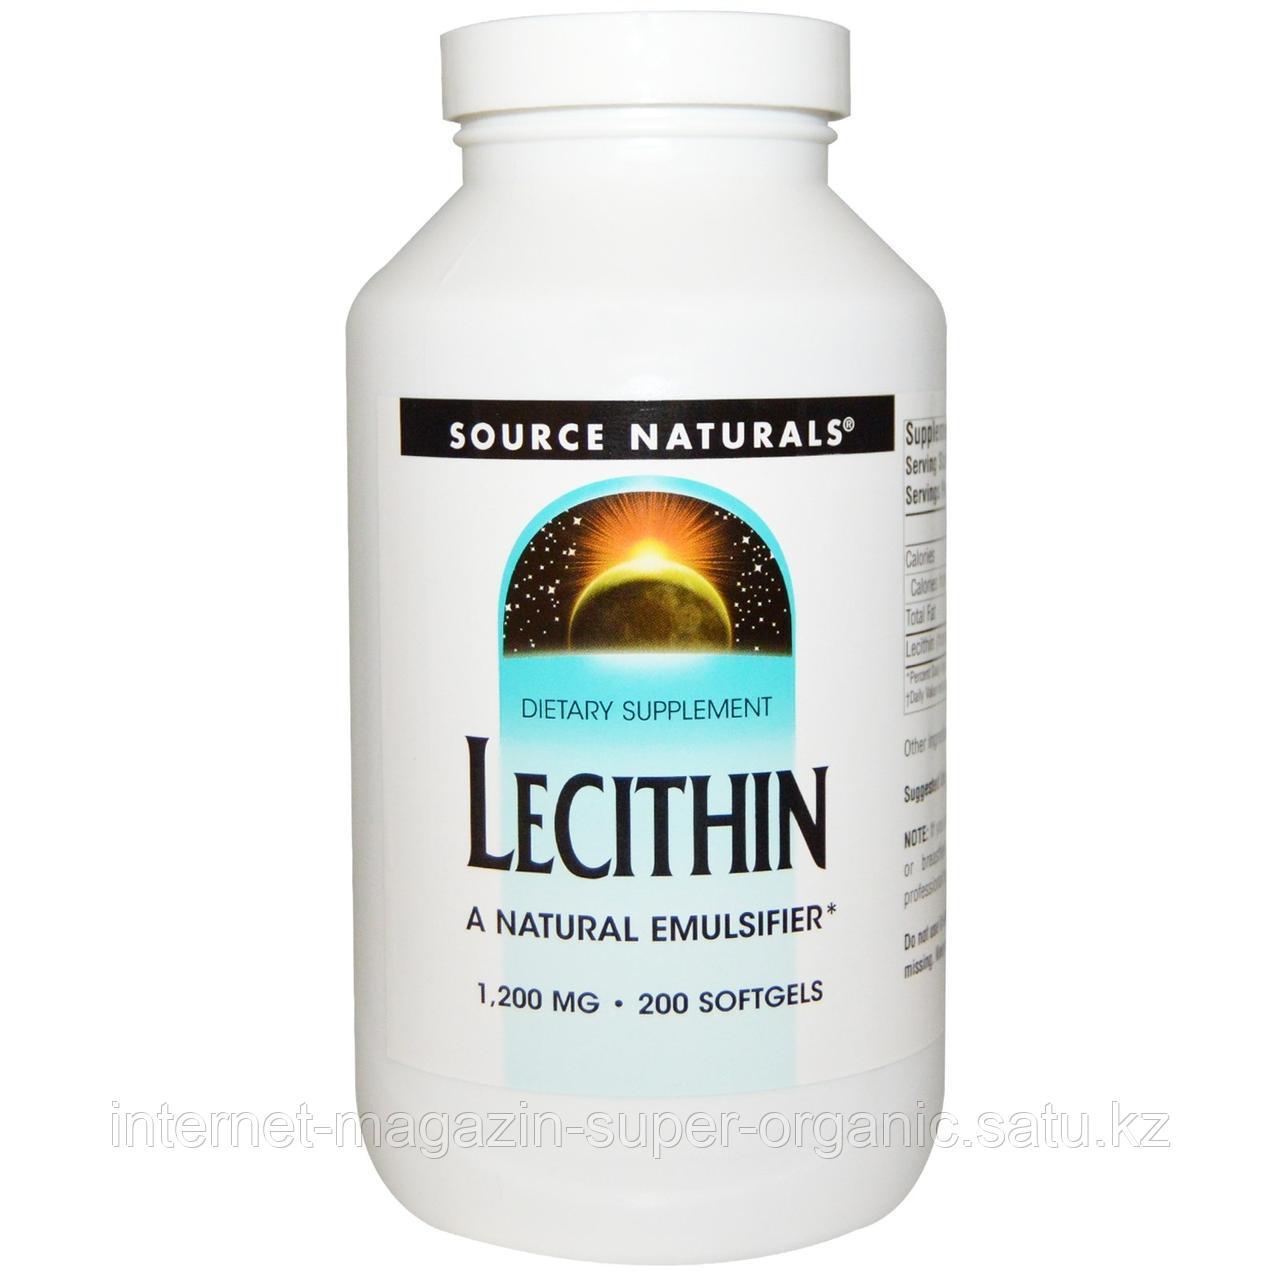 Лецитин, 200 гелевых капсул, Source Naturals